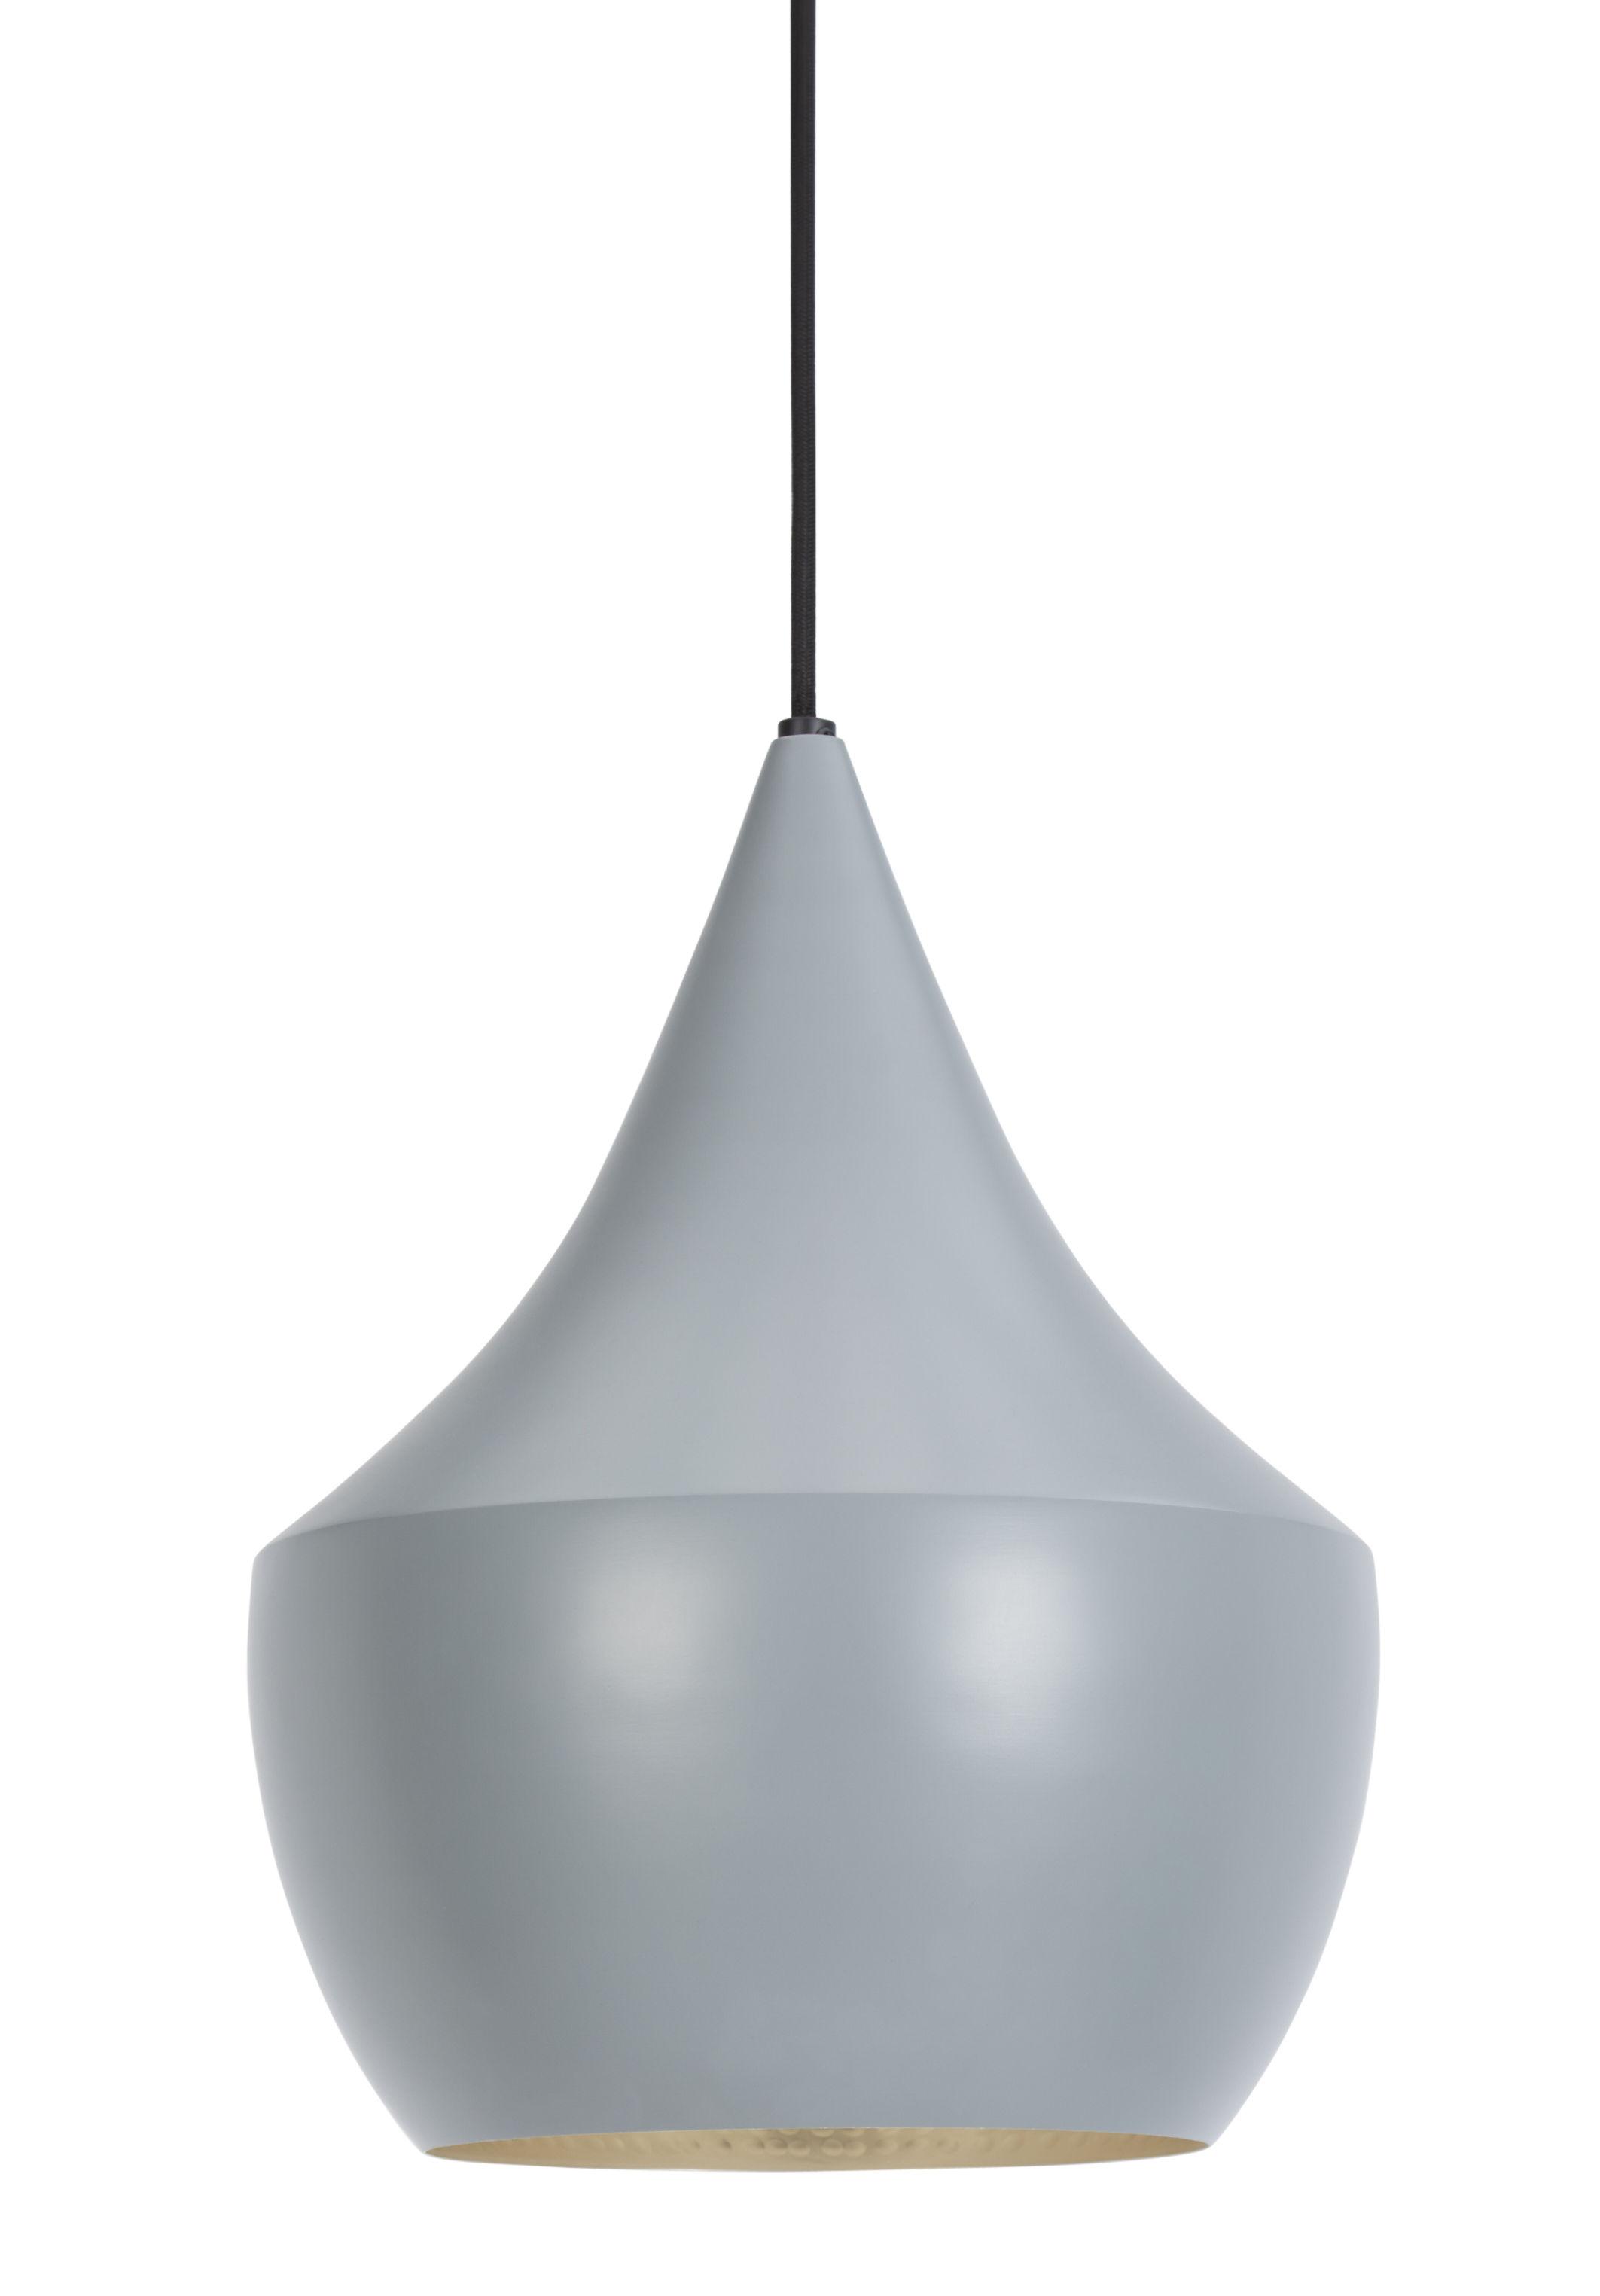 Lighting - Pendant Lighting - Beat Fat Pendant by Tom Dixon - Grey / Silver inside - Brass